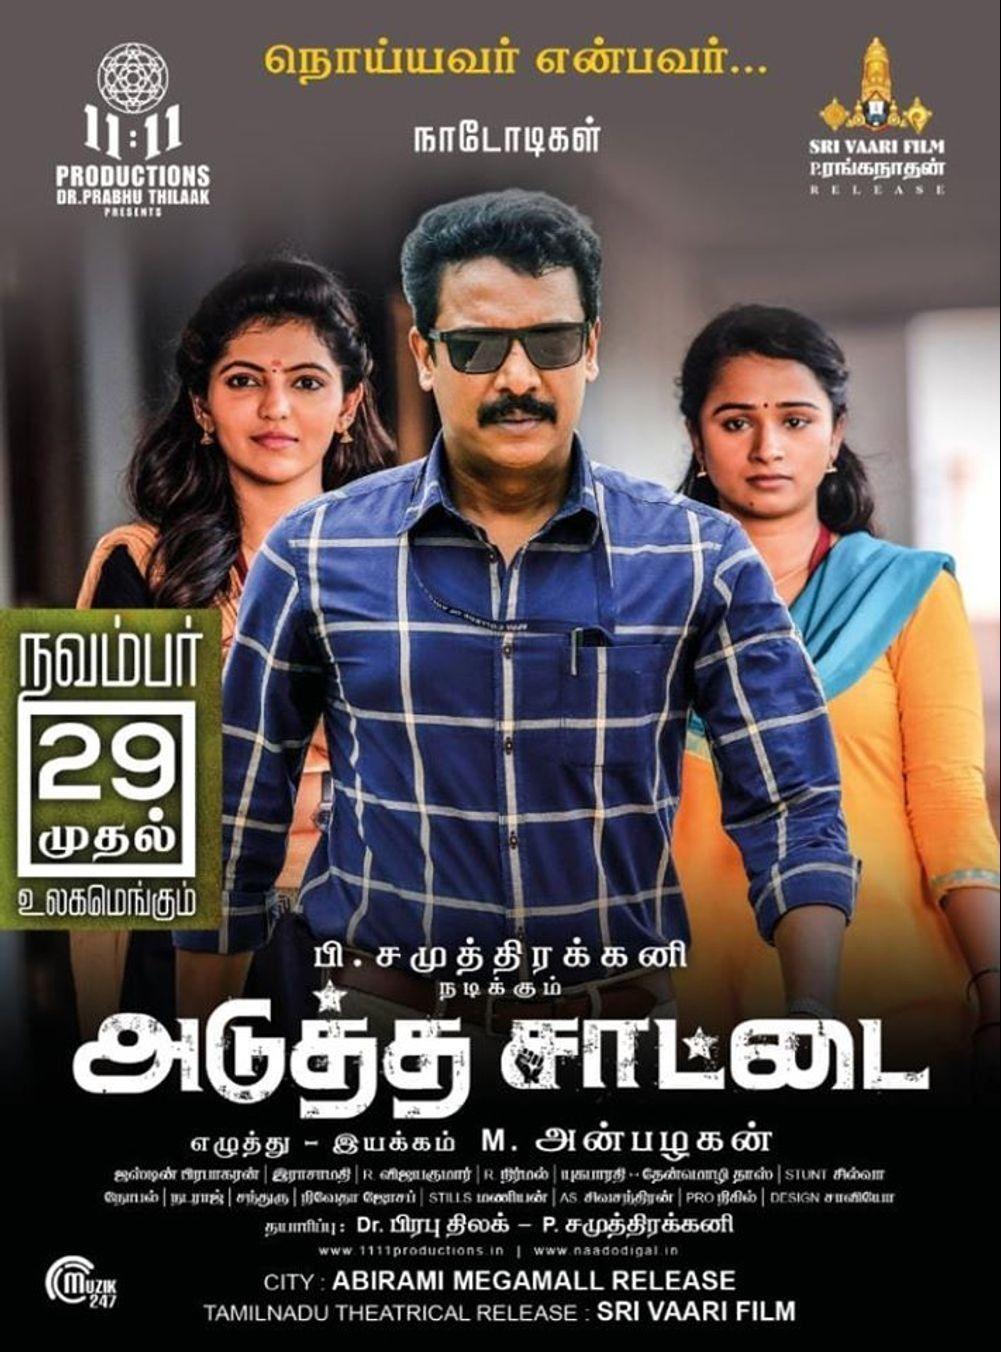 Adutha Saattai Movie Latest Hd Photos, Posters & Wallpapers - Adutha Saattai Movie Poster - HD Wallpaper